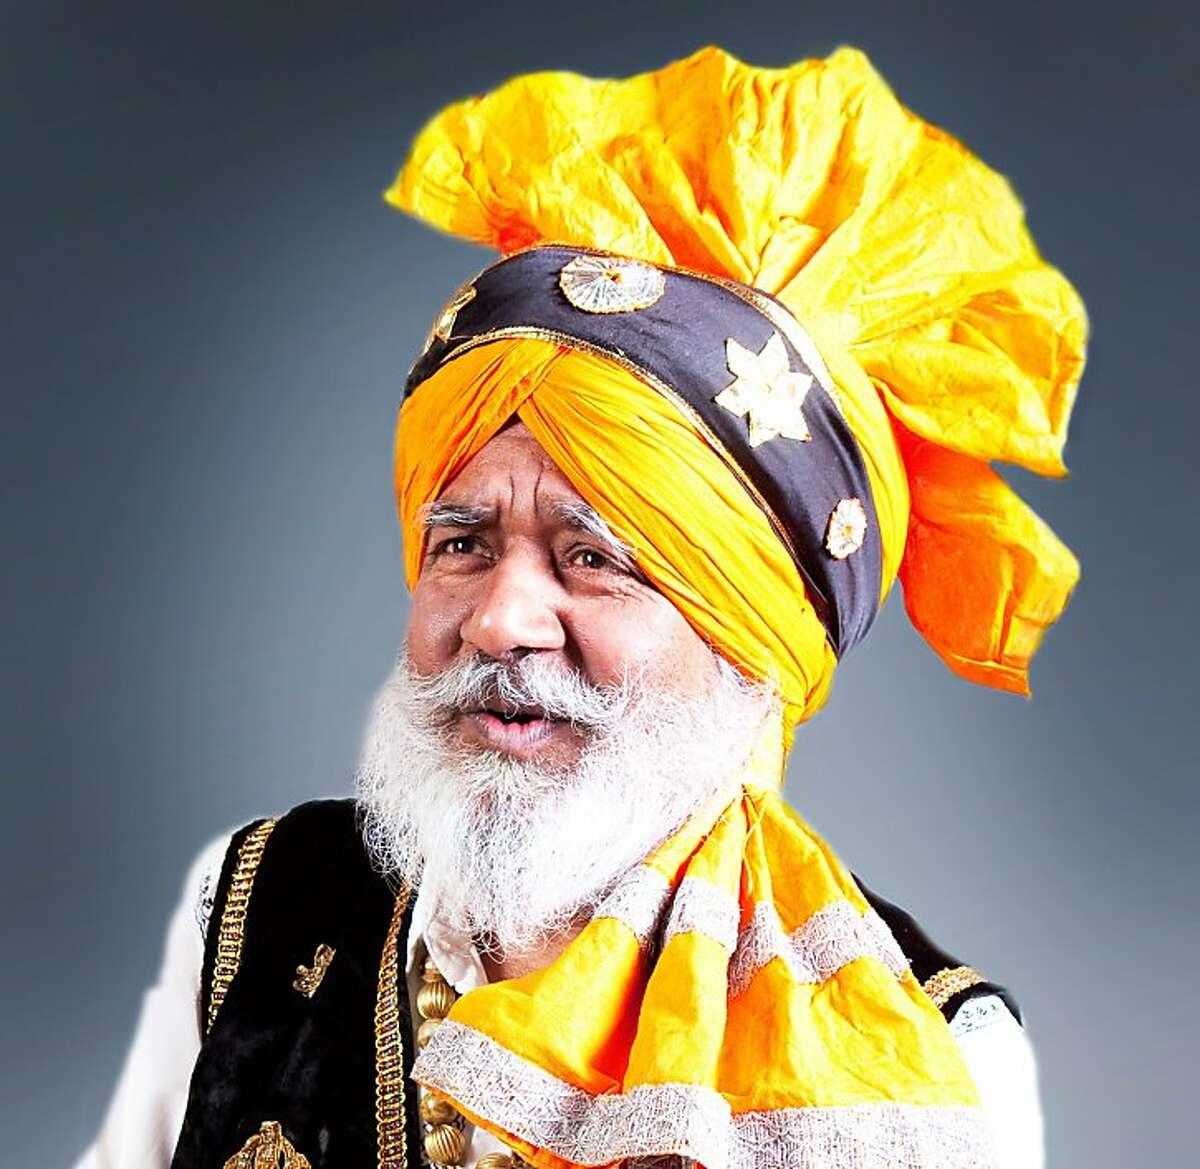 Ustad Lal Singh Bhatti of BlackMahal